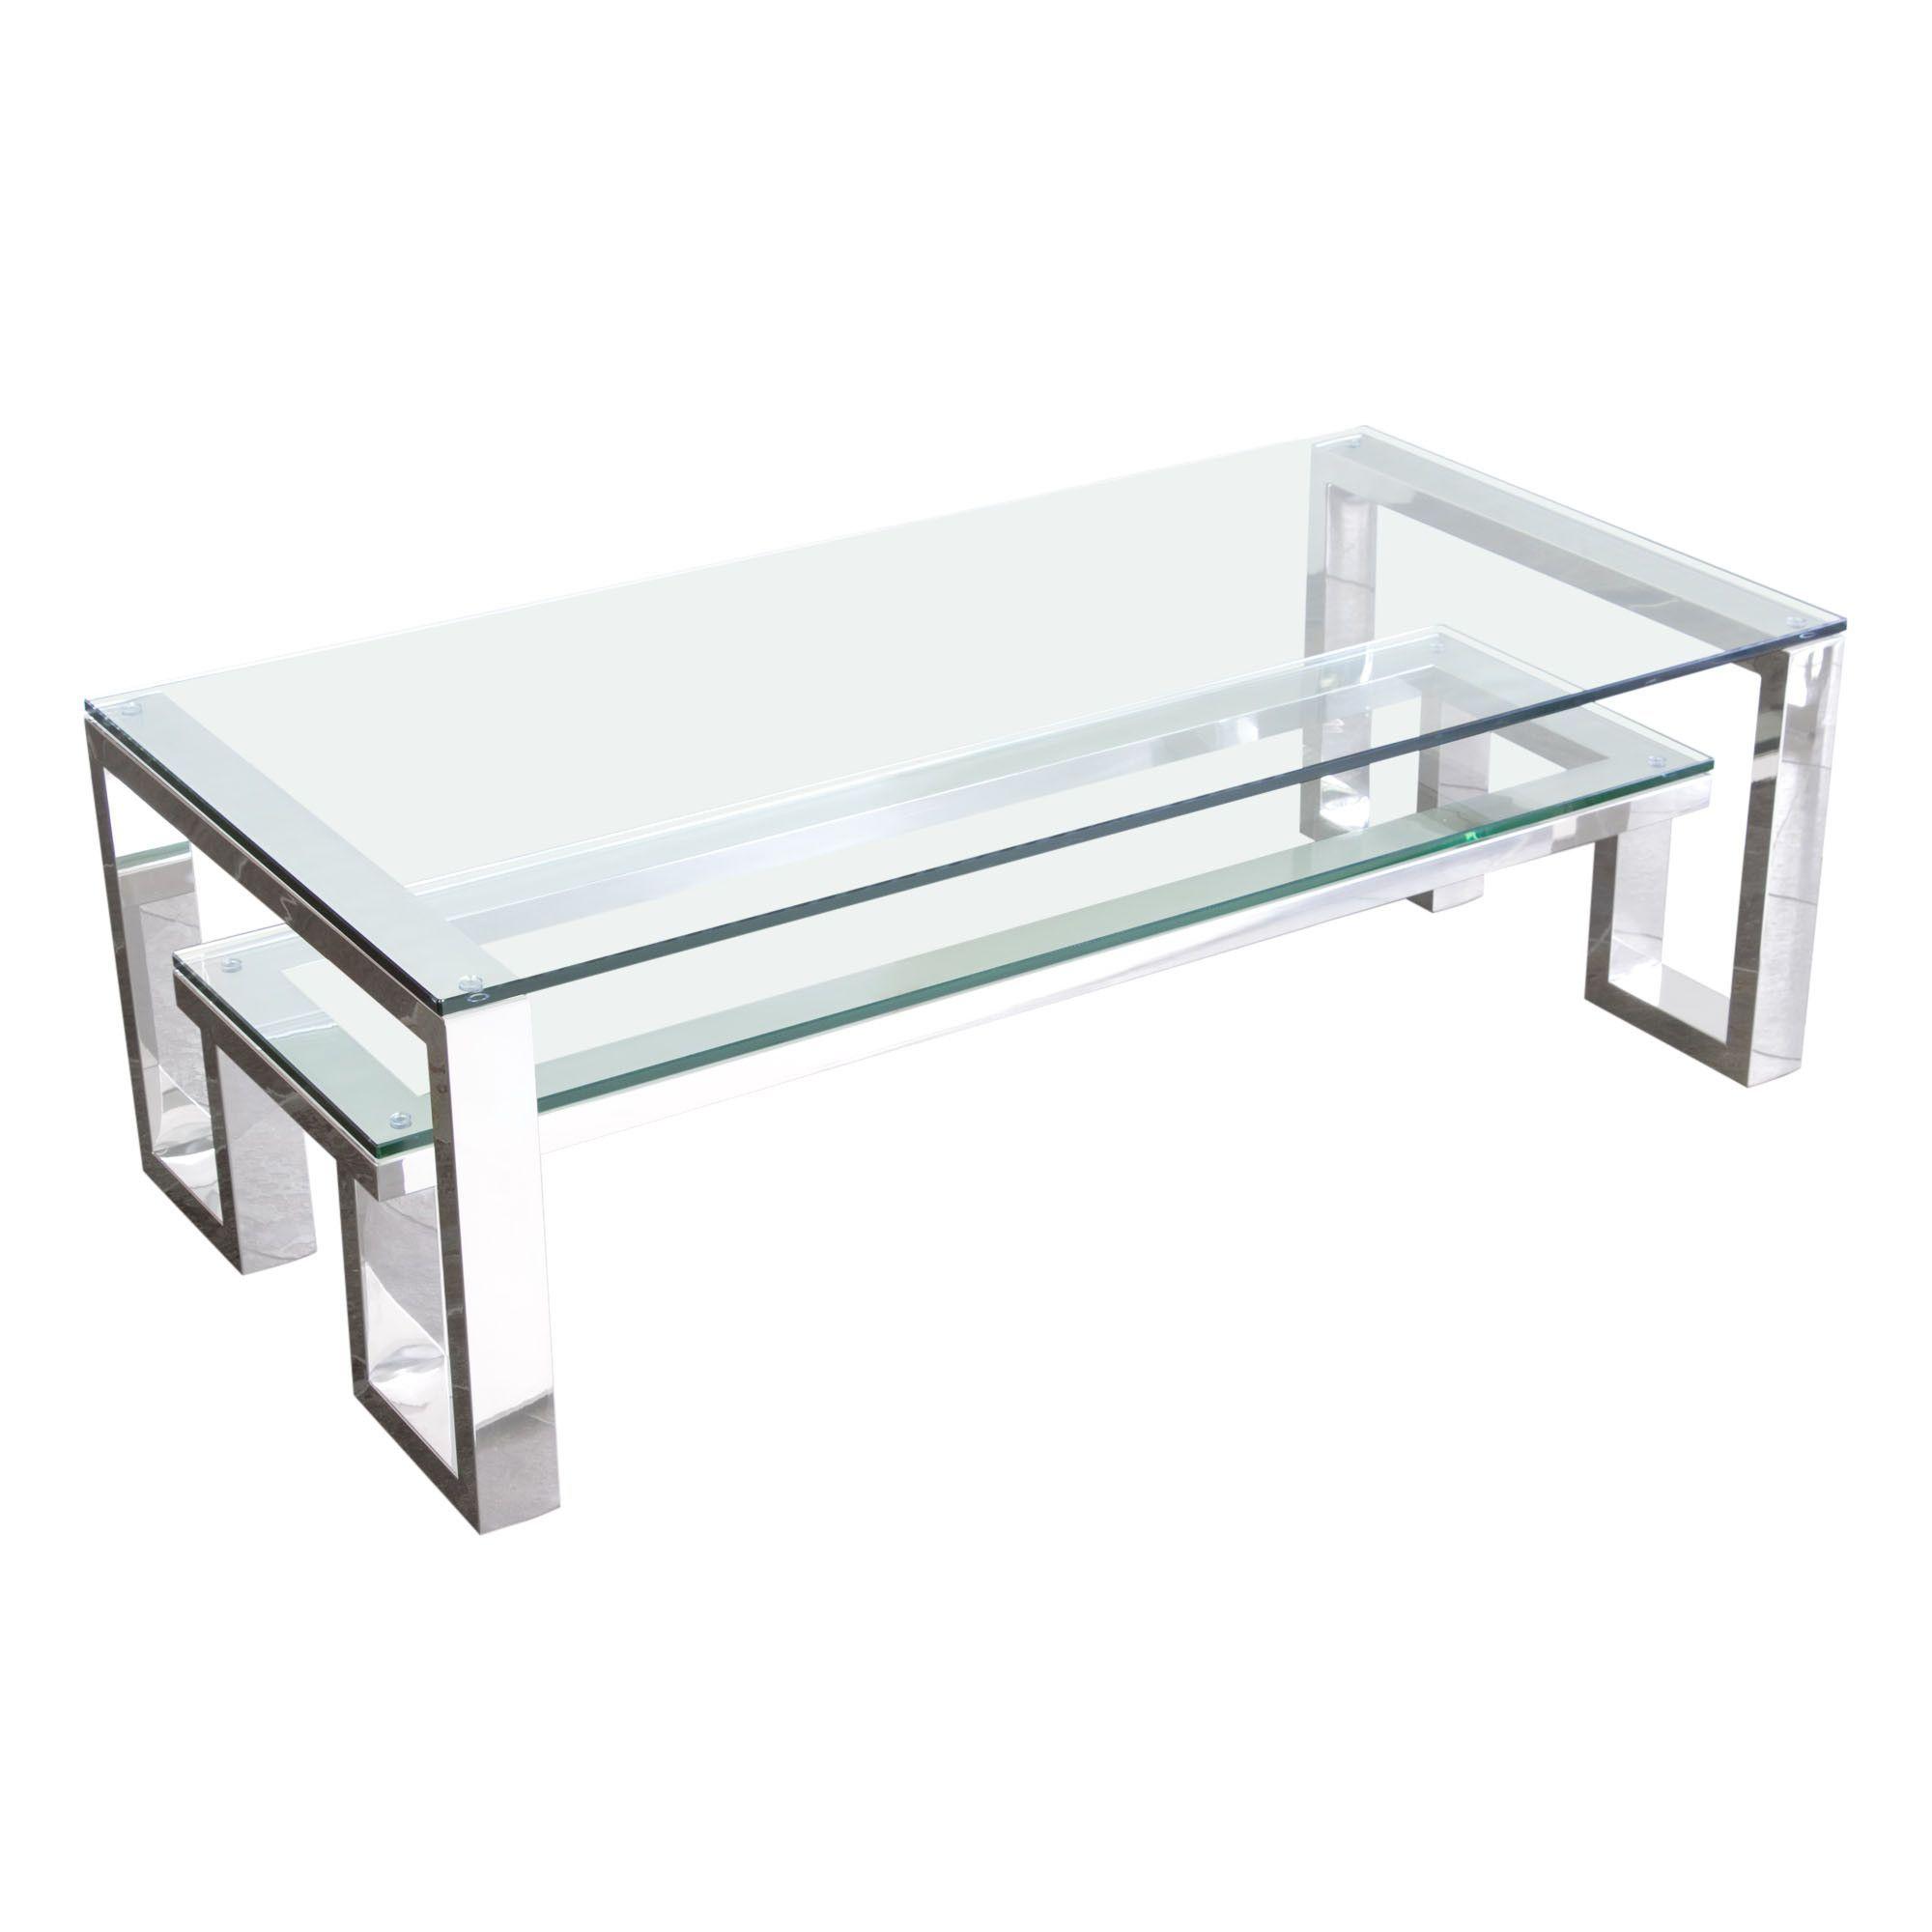 Carlsbad Cocktail Table With Clear Glass Top Shelf With Stainless Steel Frame By Diamond Sofa Mesa De Centro De Vidrio Mesas De Comedor Comedores De Vidrio [ 2000 x 2000 Pixel ]